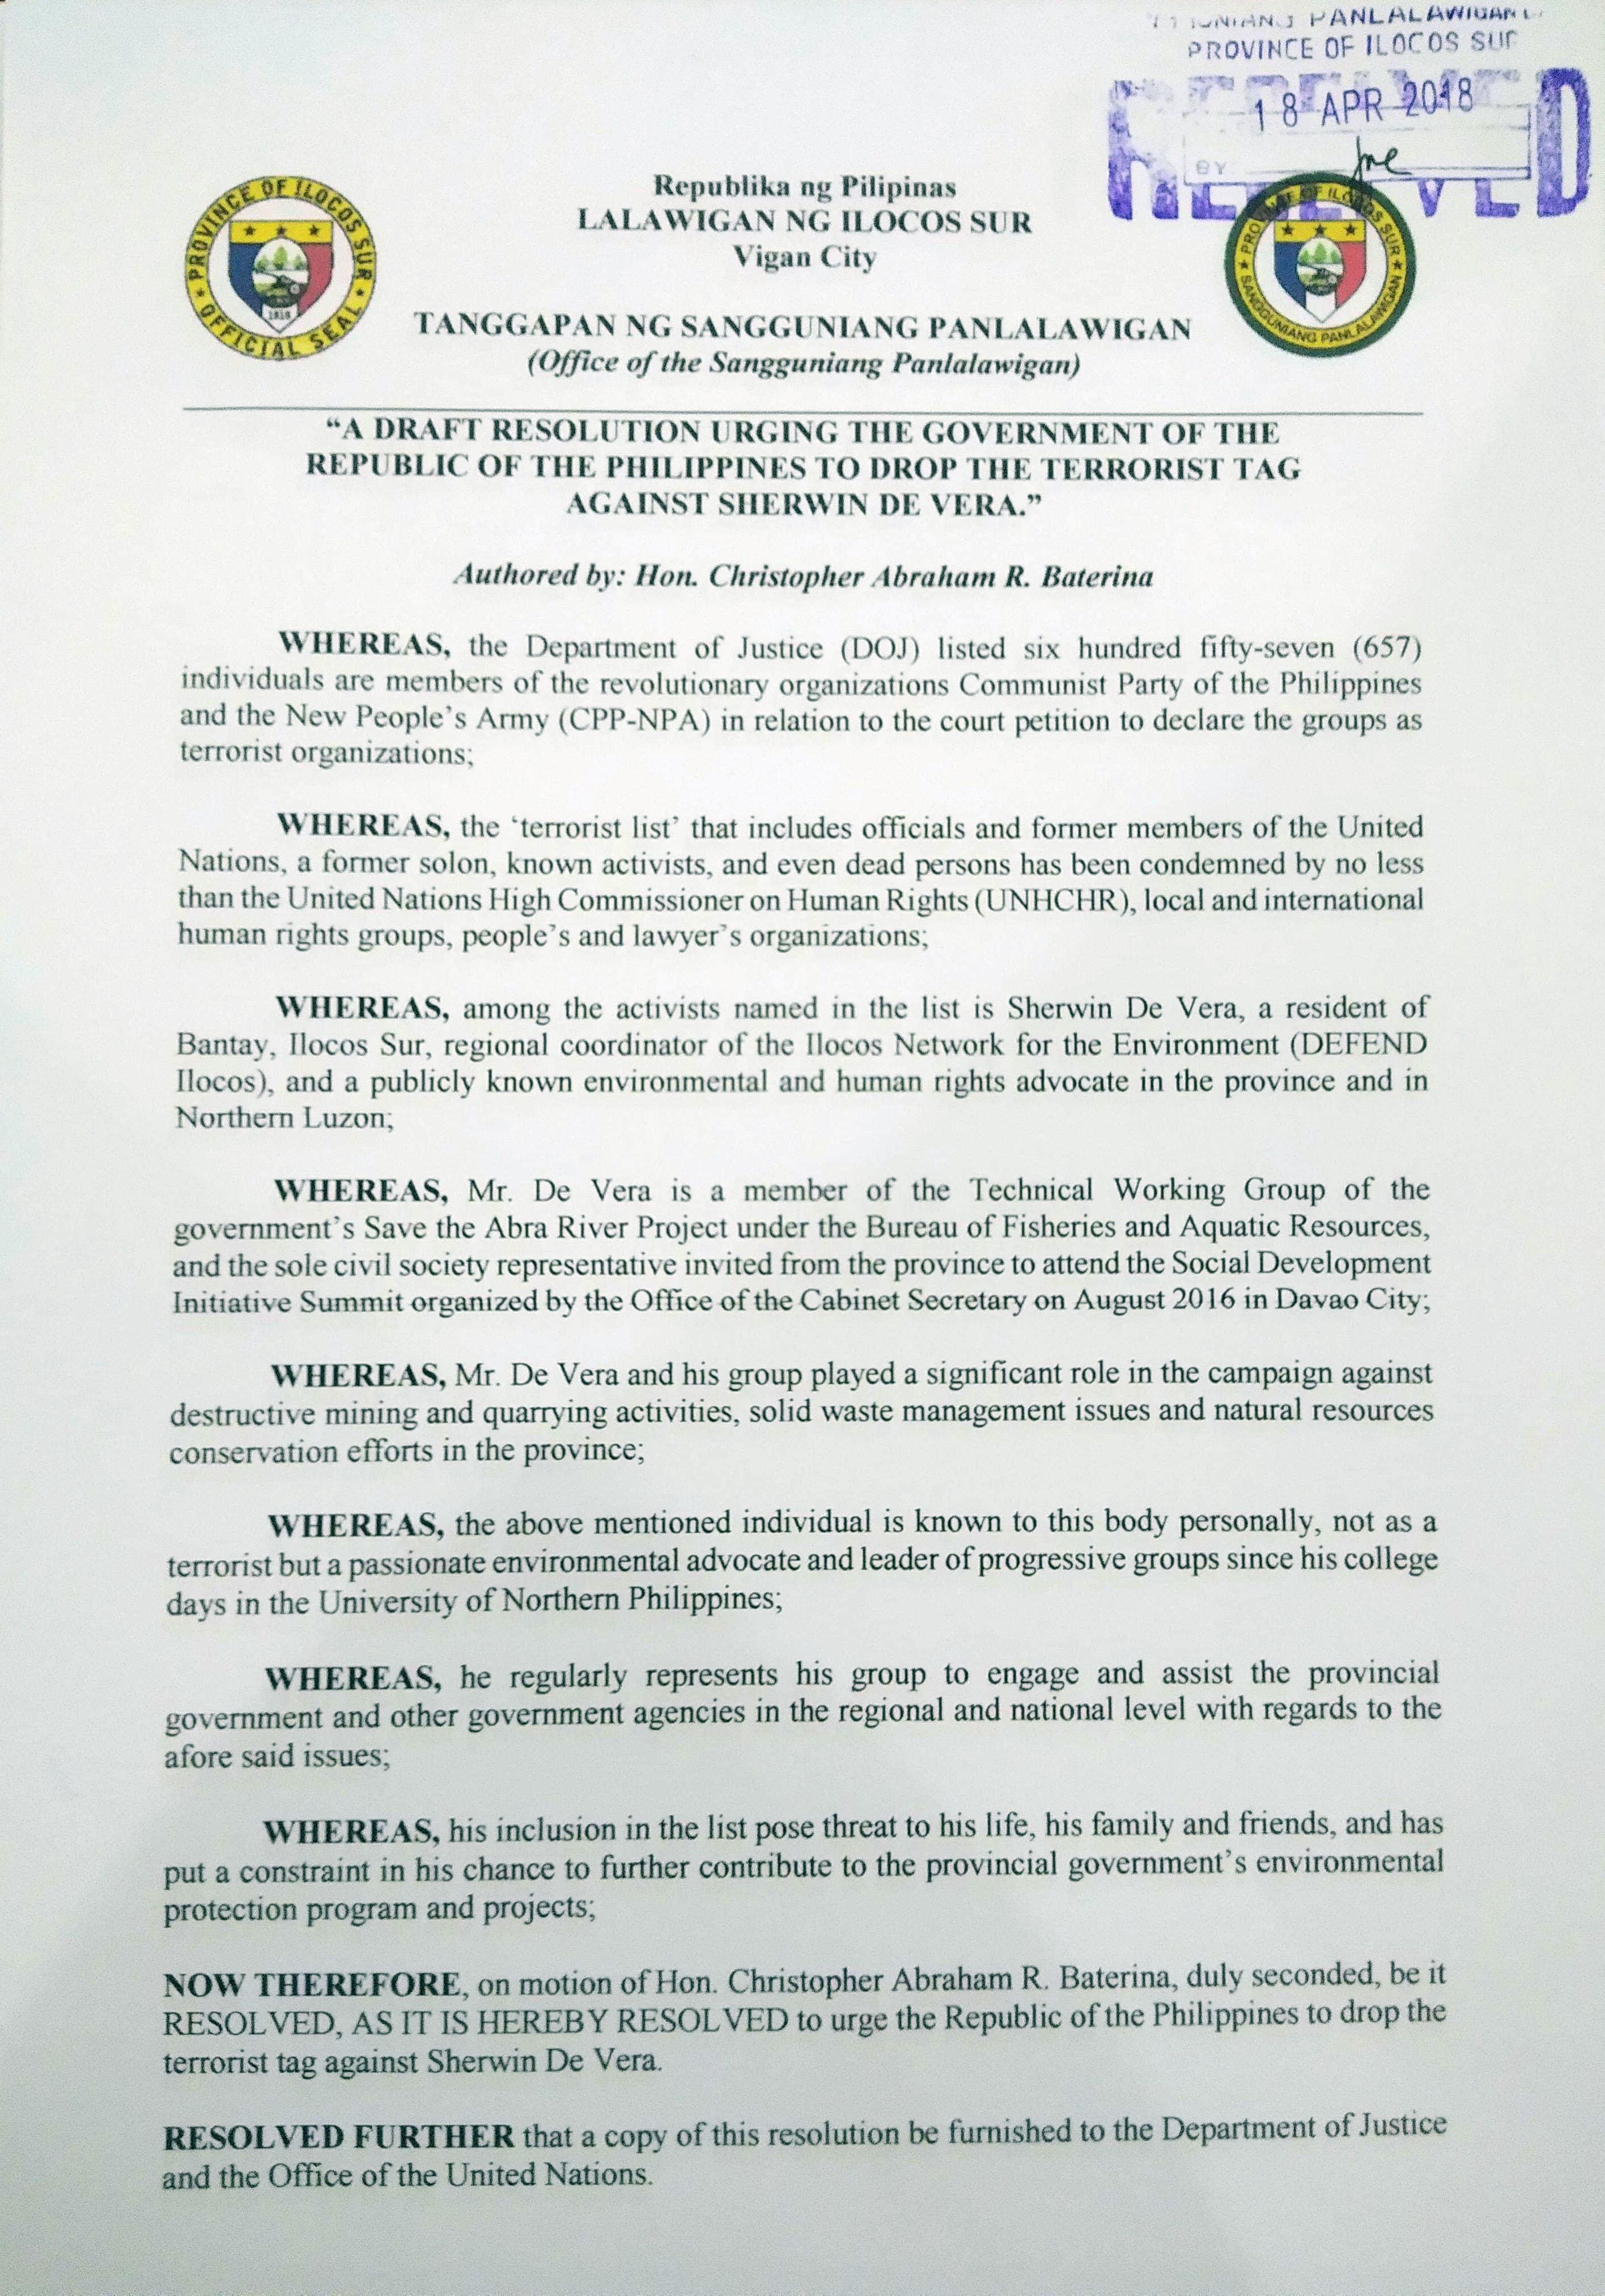 I.Sur Provincial Resolution supporting Sherwin de Vera